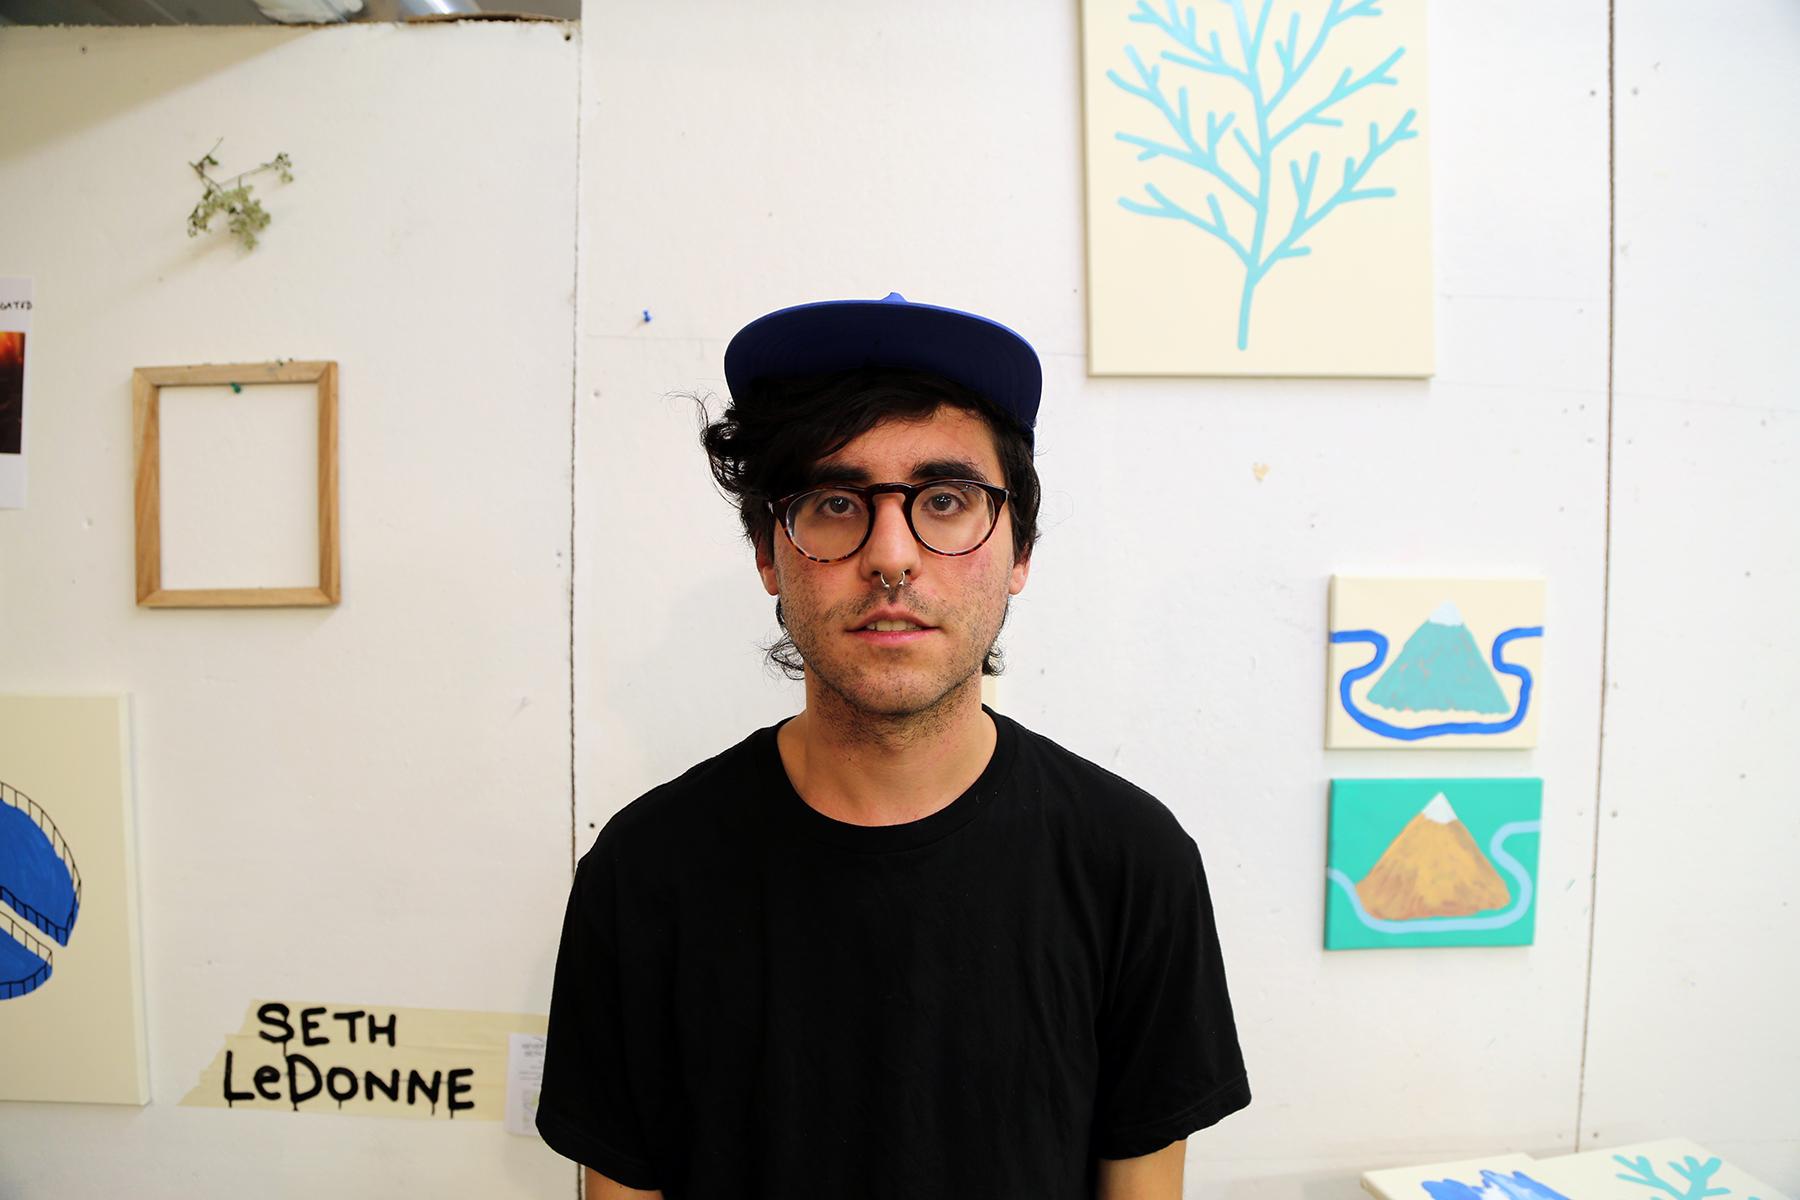 Seth LeDonne